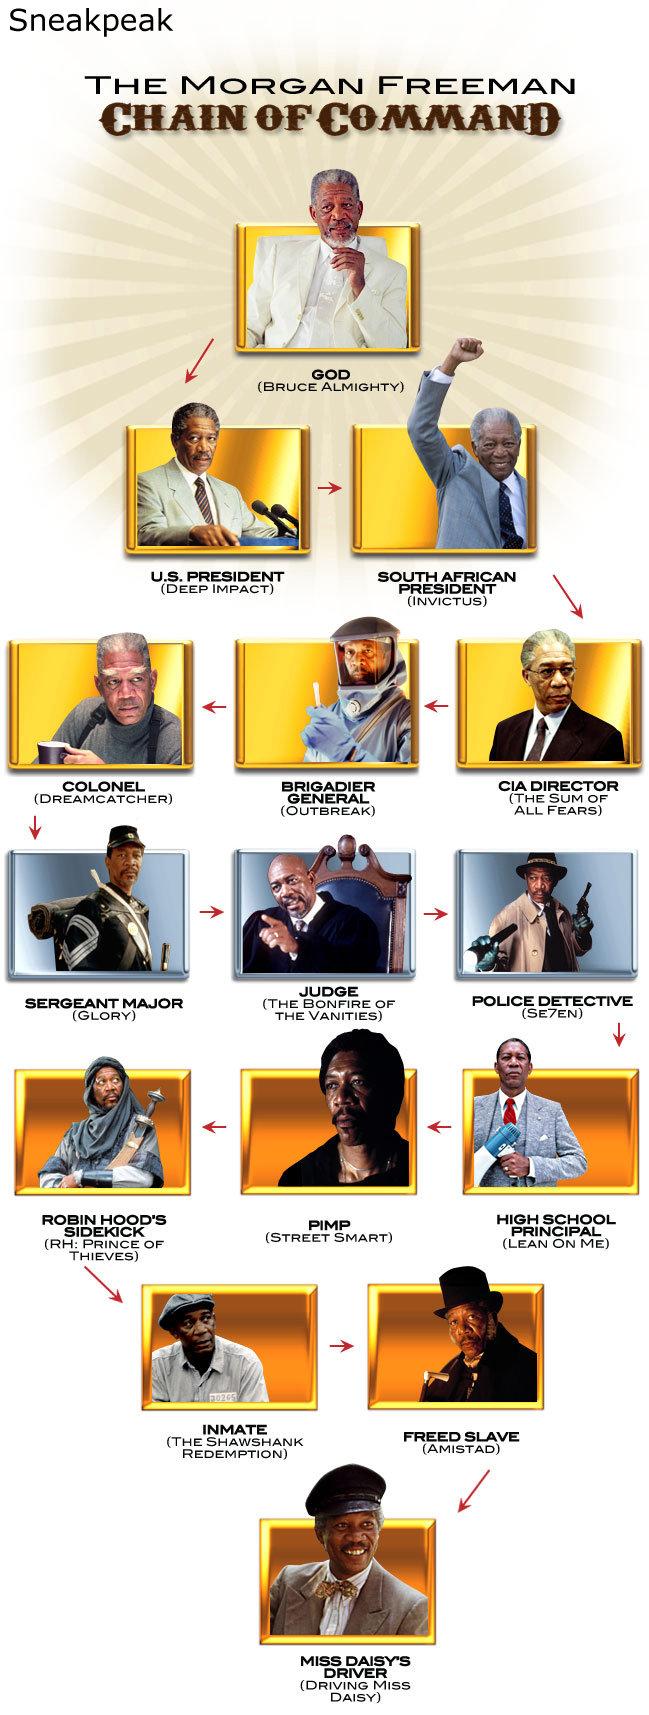 The awesomeness of Morgan Freeman. . Sneakpeak LLB. PRESIDENT ' AFRICAN in EEP IMPACT} PRESIDENT BRIGADIER (HA DIRECTER resola) GENERAL {THE SLIM OF AK) ALI. FE Morgan freeman hello